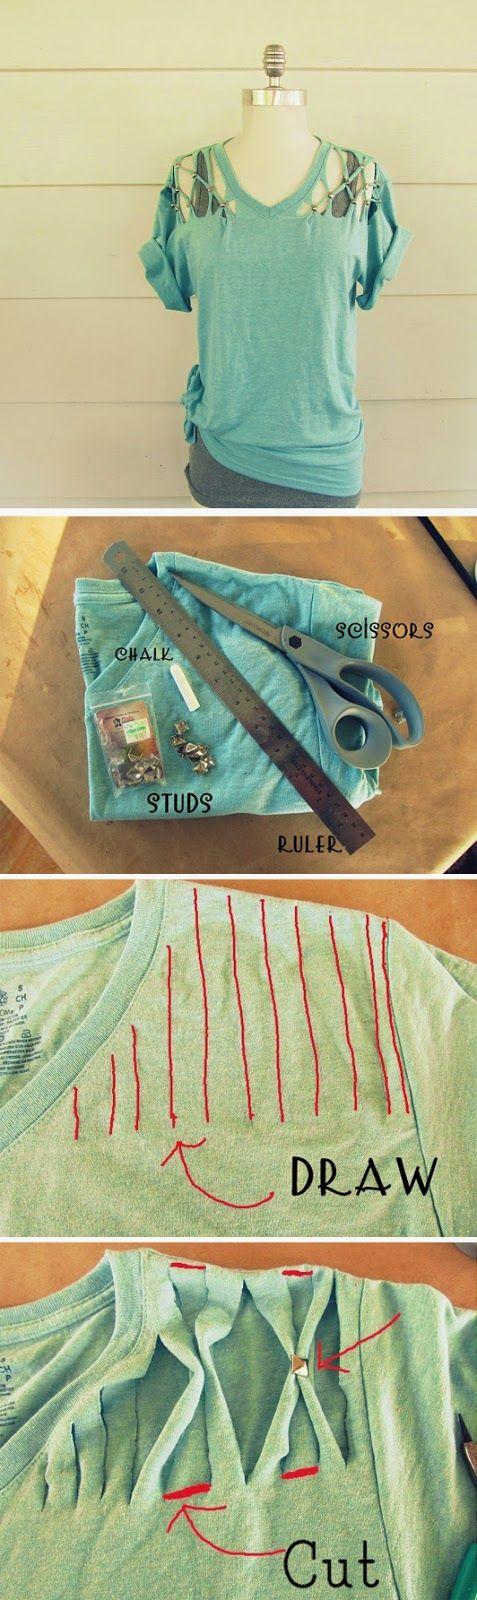 ABCDIY: 16 Upcycled and Refashioned TShirt DIY